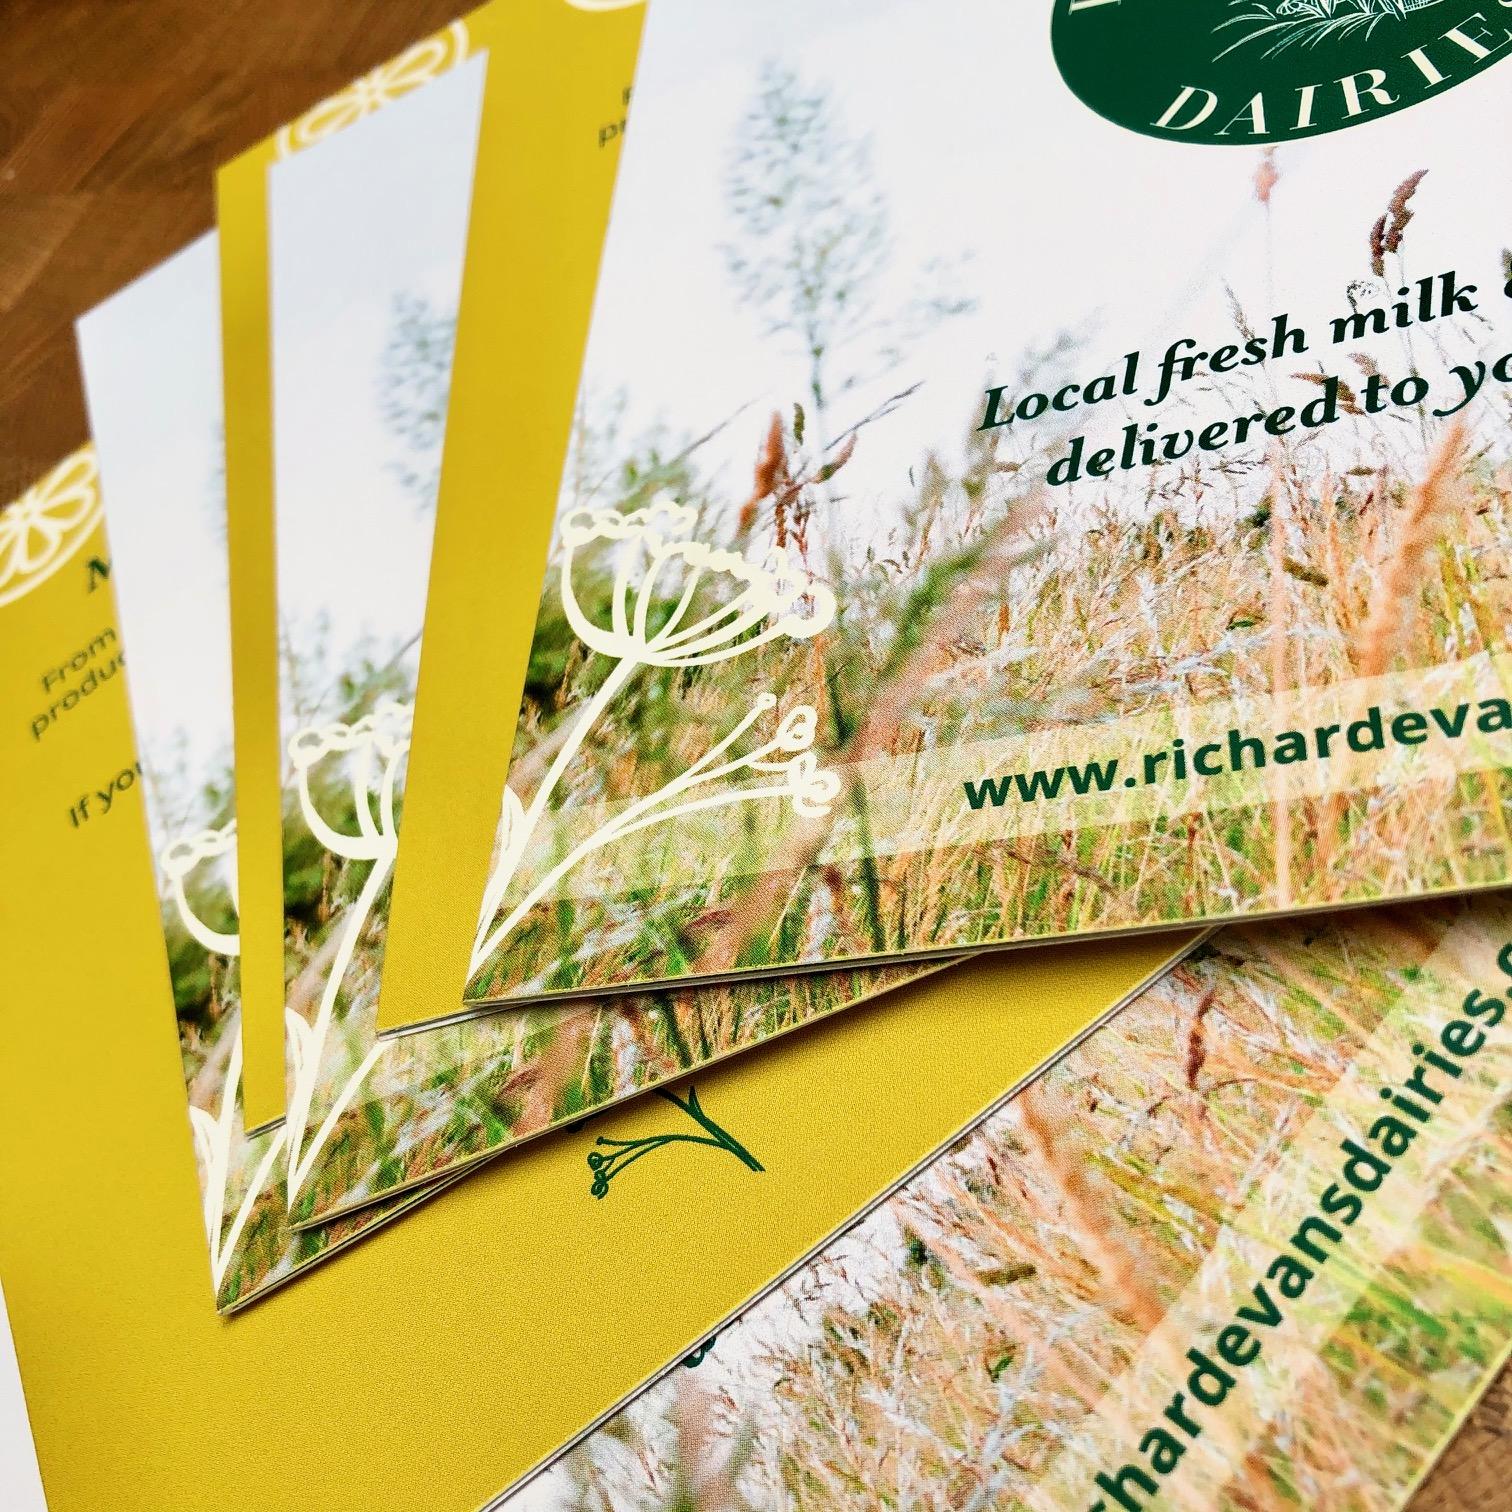 Richard Evans Dairies folded leaflets